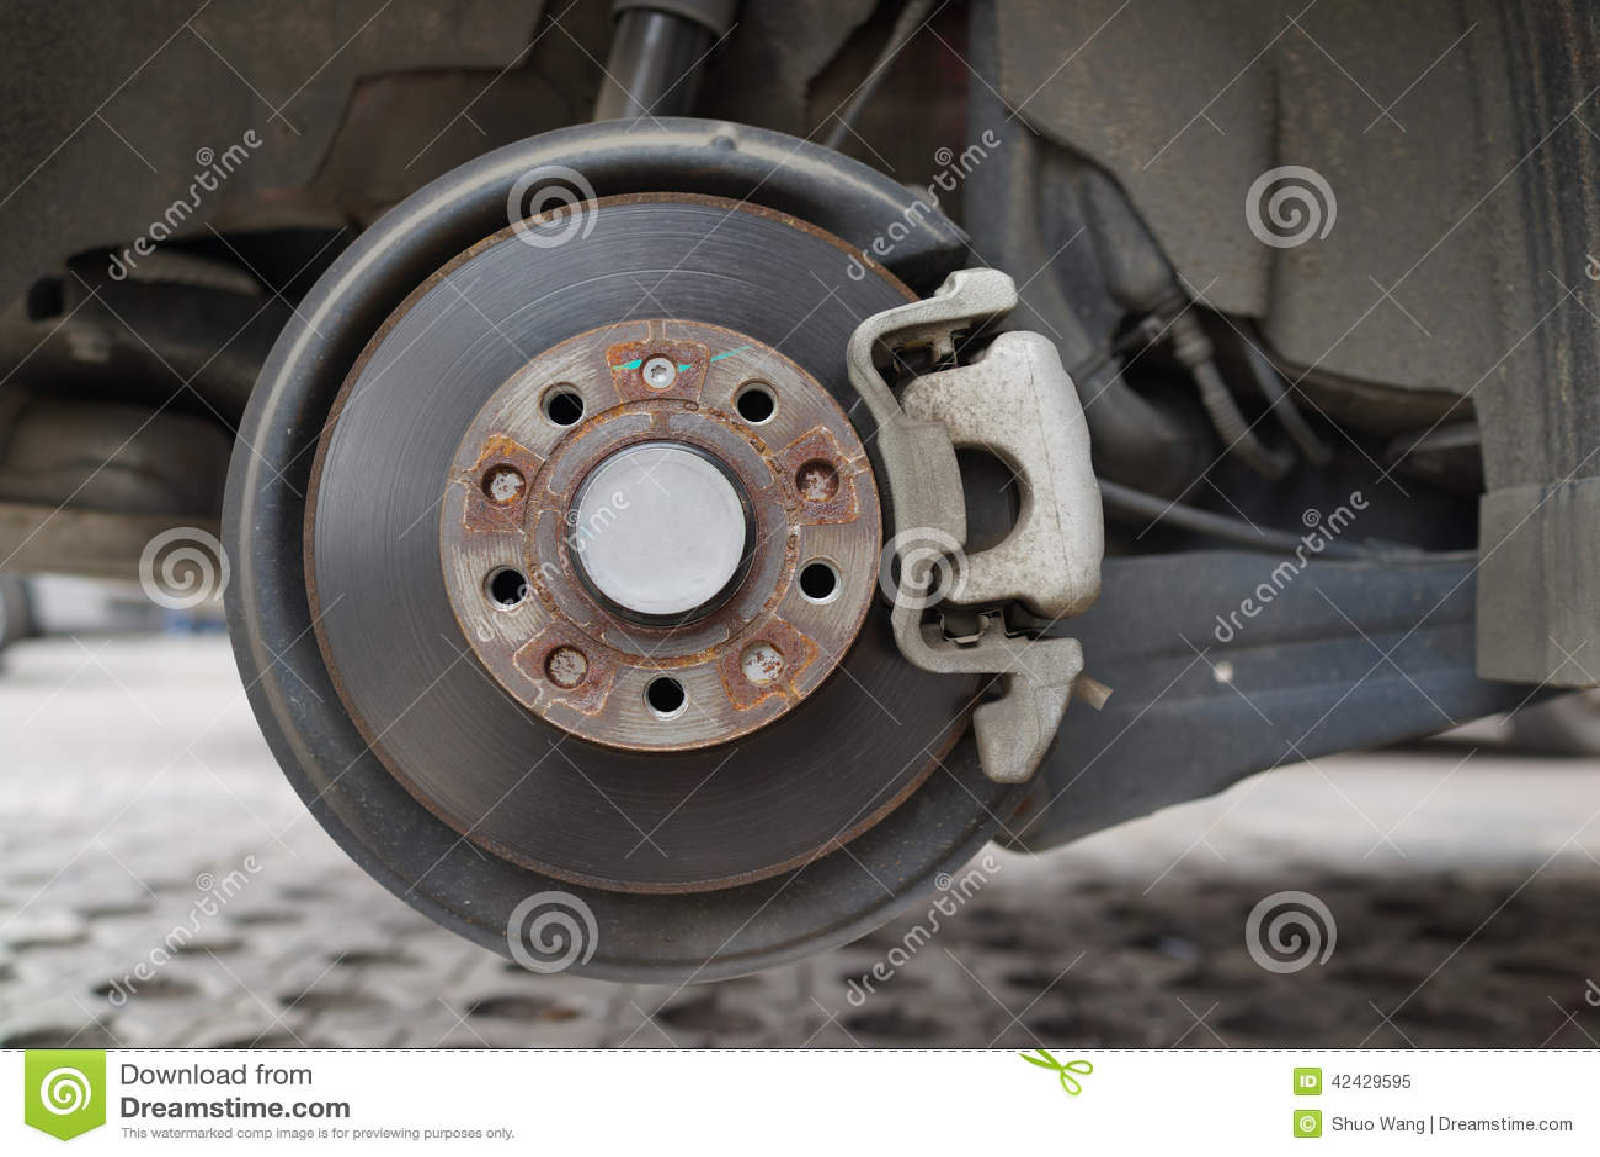 Change wheels